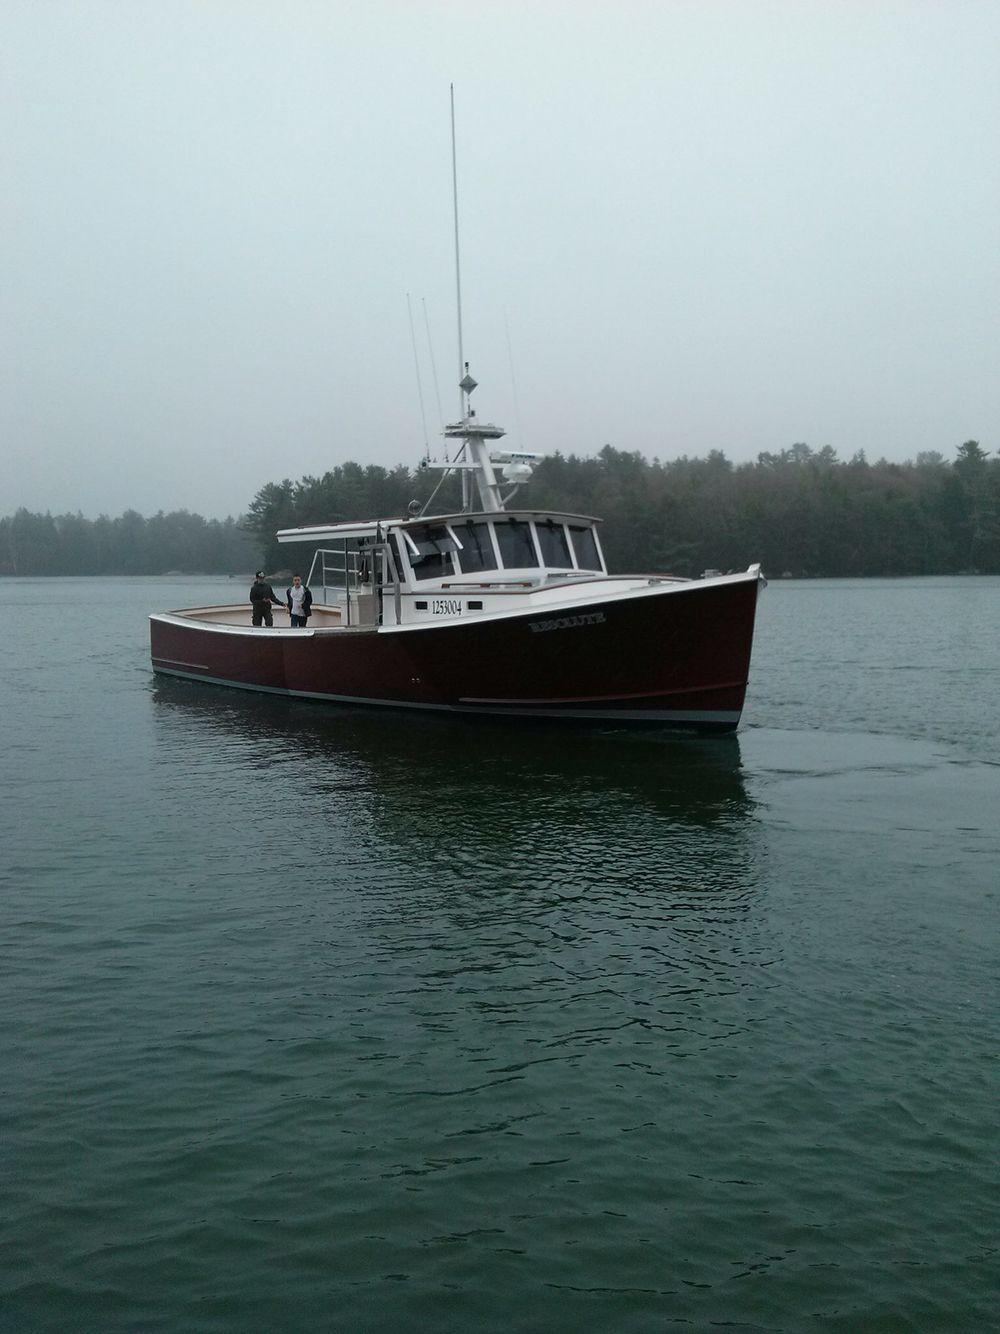 Boats yachts maine boats lobster boats picnic boats sailing - Lobster Boat Johns Bay Boat Company